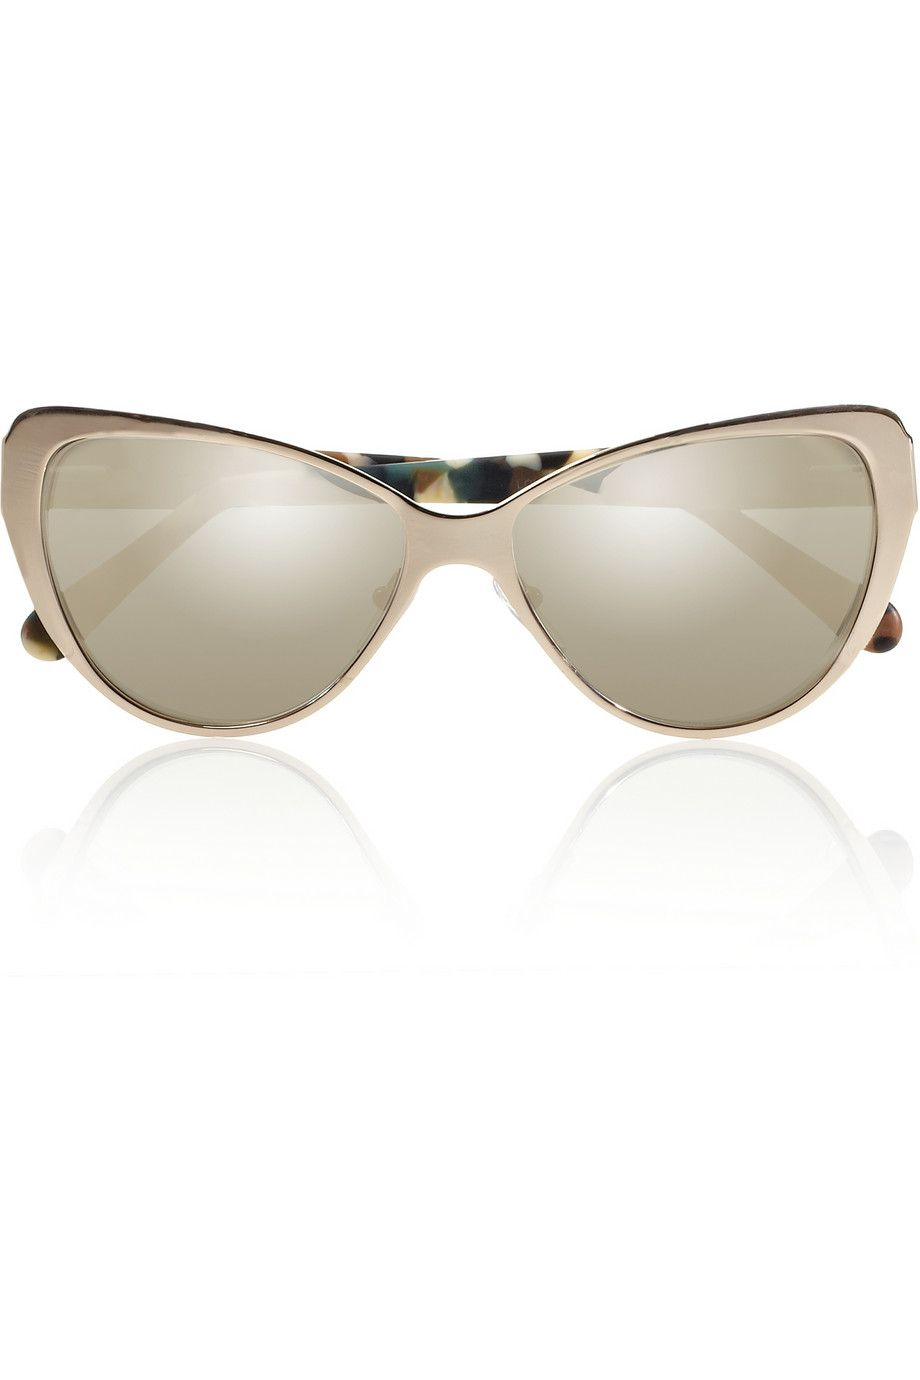 Prism|Capri cat eye metal and acetate mirrored sunglasses|NET-A-PORTER.COM